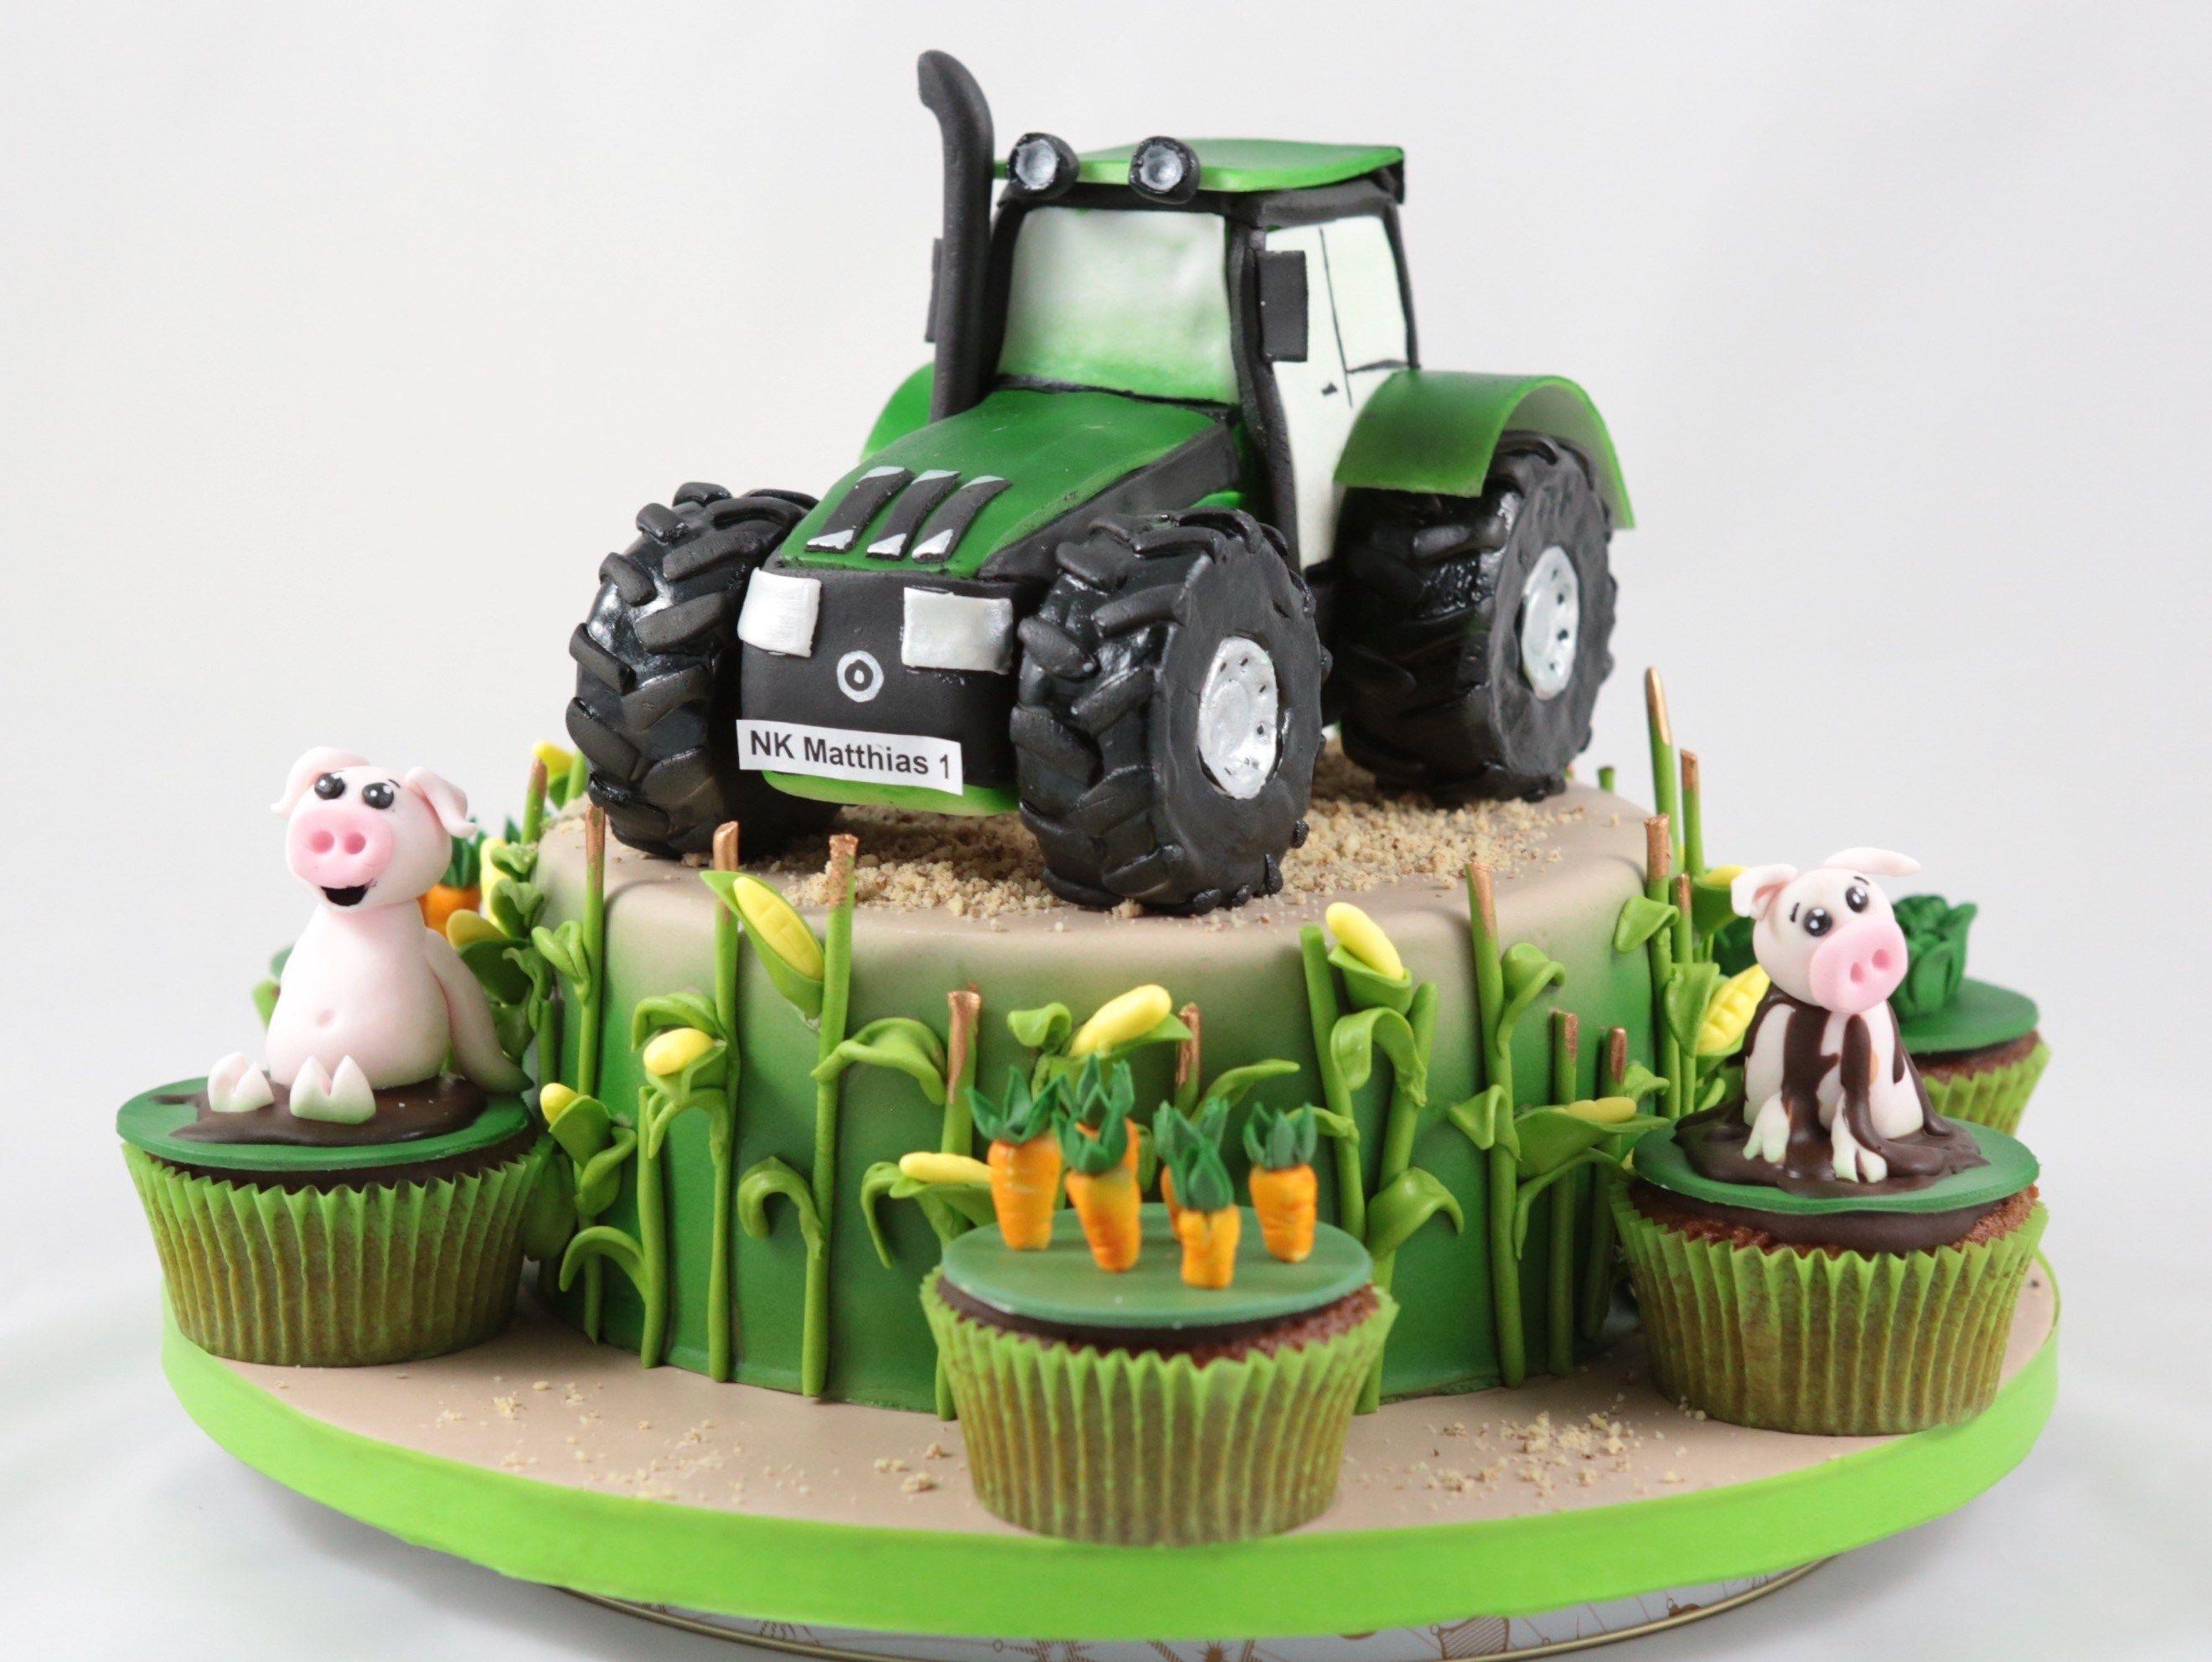 Tractor Cake Traktor Torte Caketopper Bauernhof Kommunion Cake